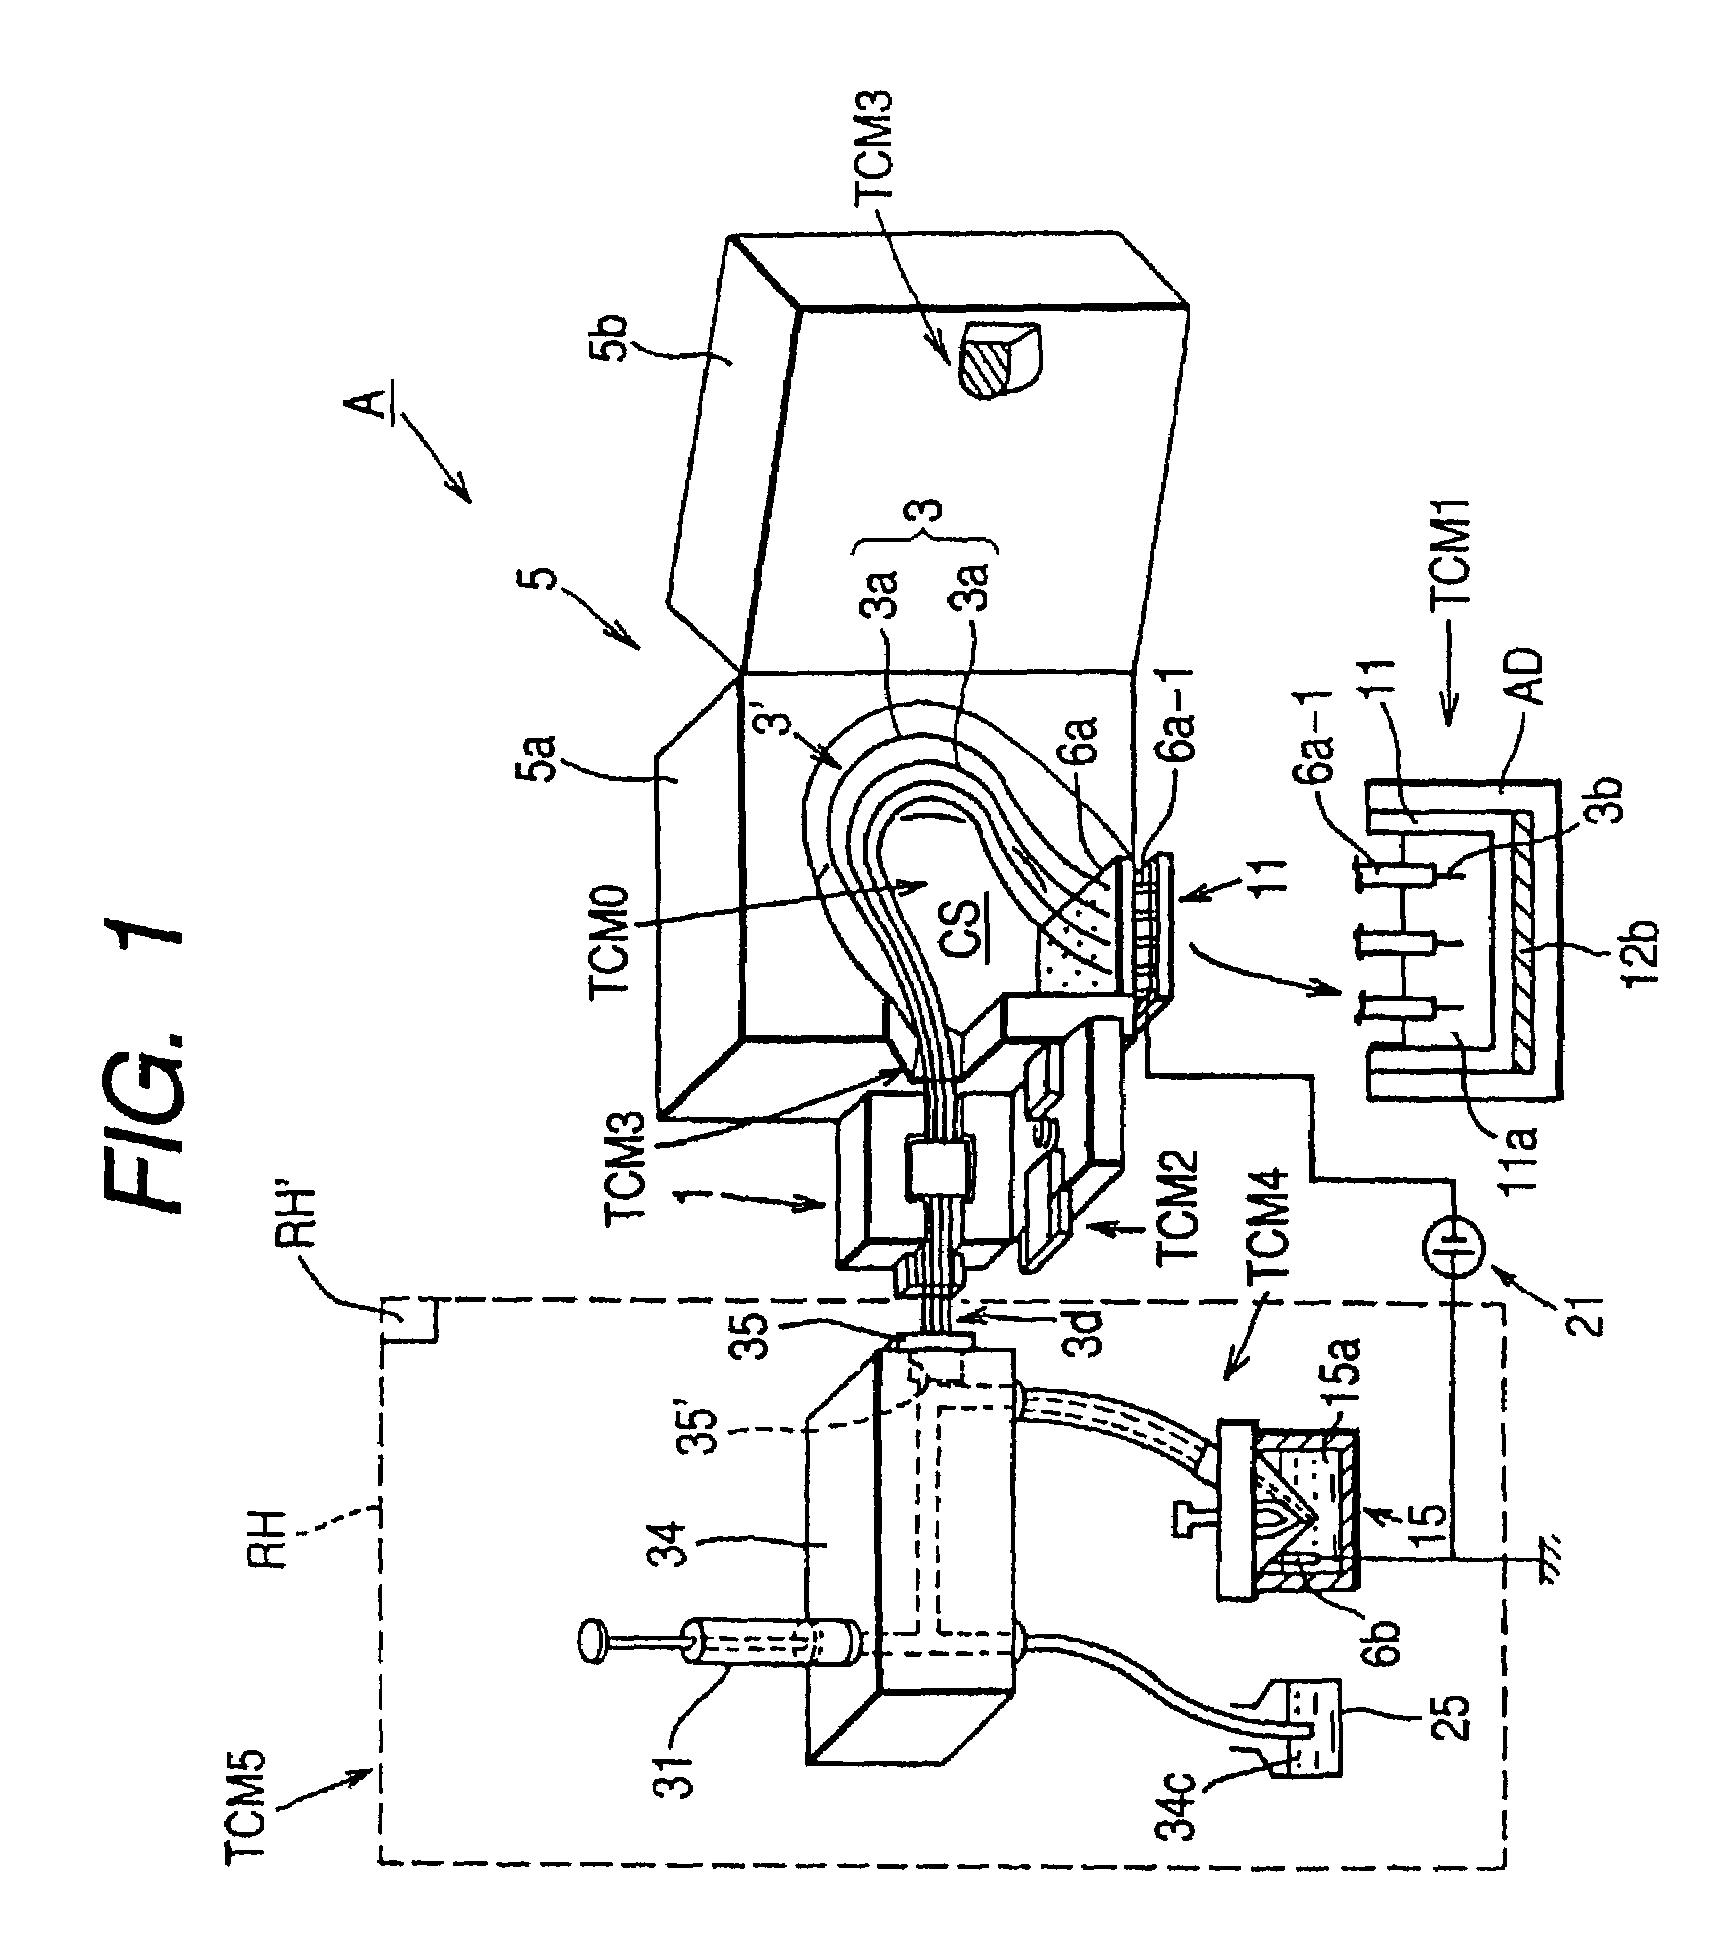 patent us7459068 - multi-capillary electrophoresis apparatus